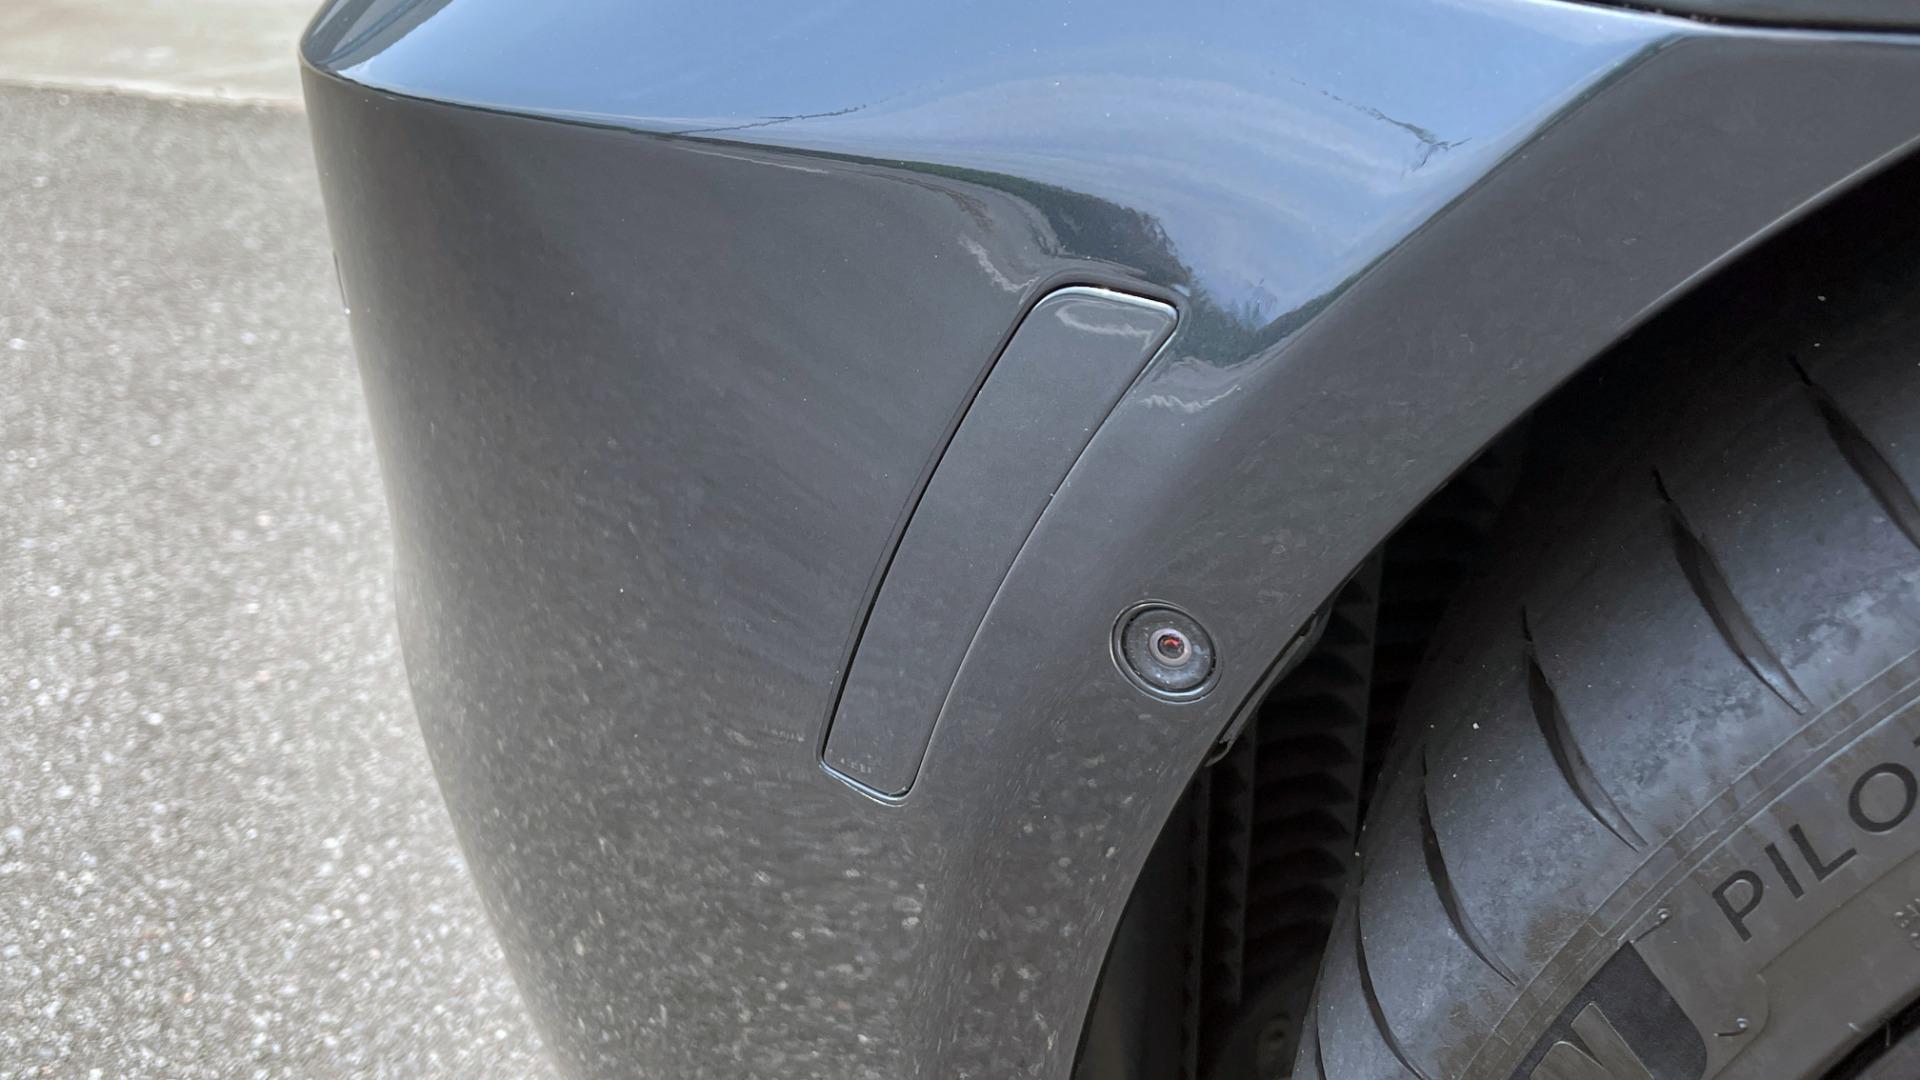 Used 2015 BMW M5 SEDAN / EXEC PKG / HUD / NAV / B&O SND / SUNROOF / REARVIEW for sale Sold at Formula Imports in Charlotte NC 28227 7